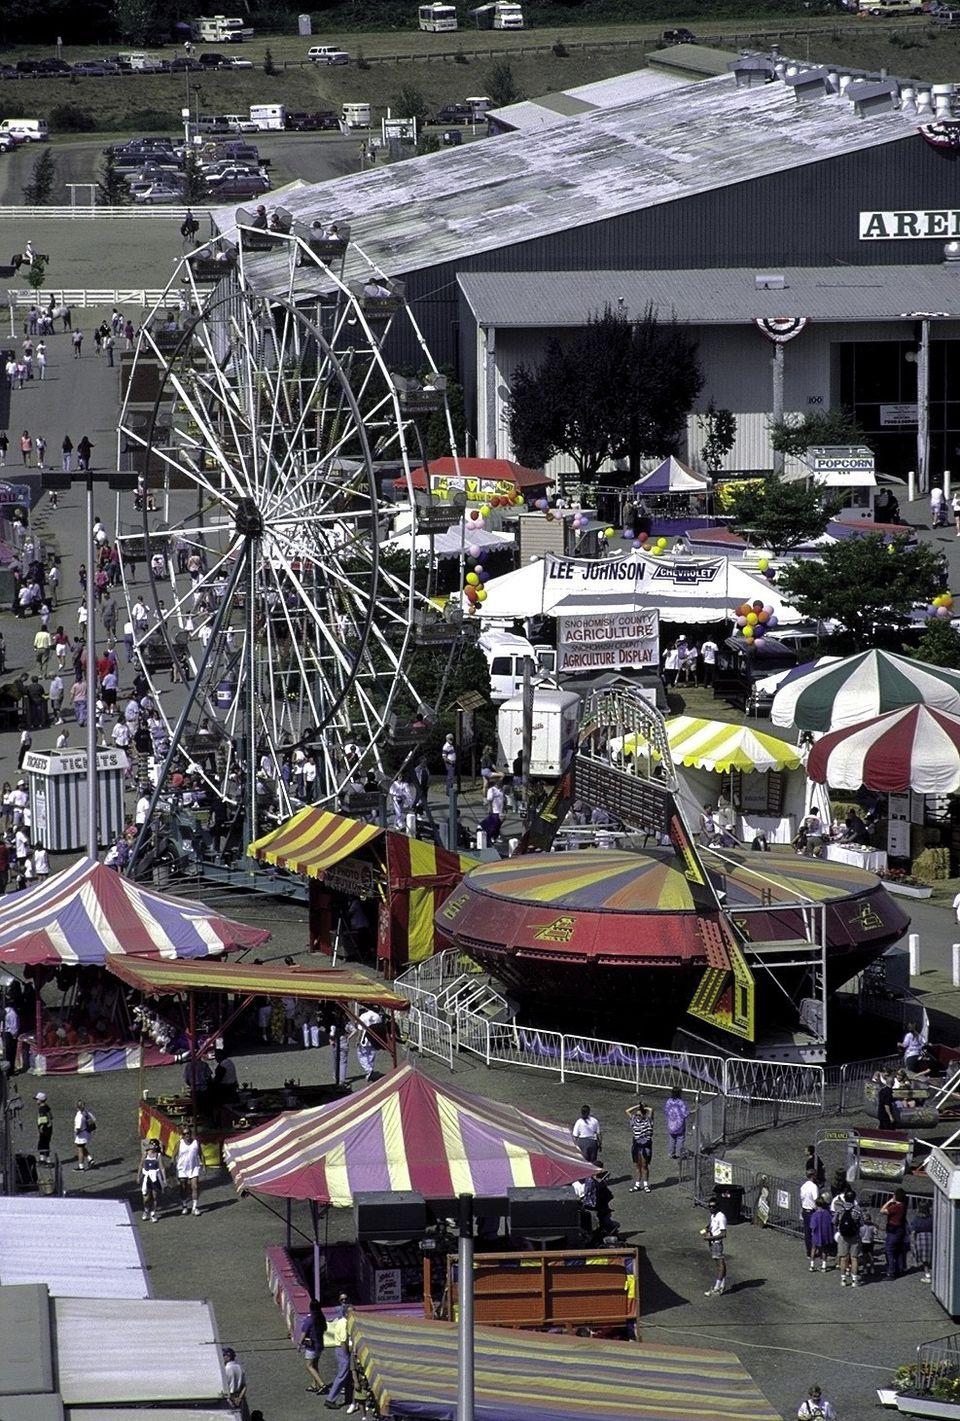 Evergreen State Fairgrounds in Monroe, Washington